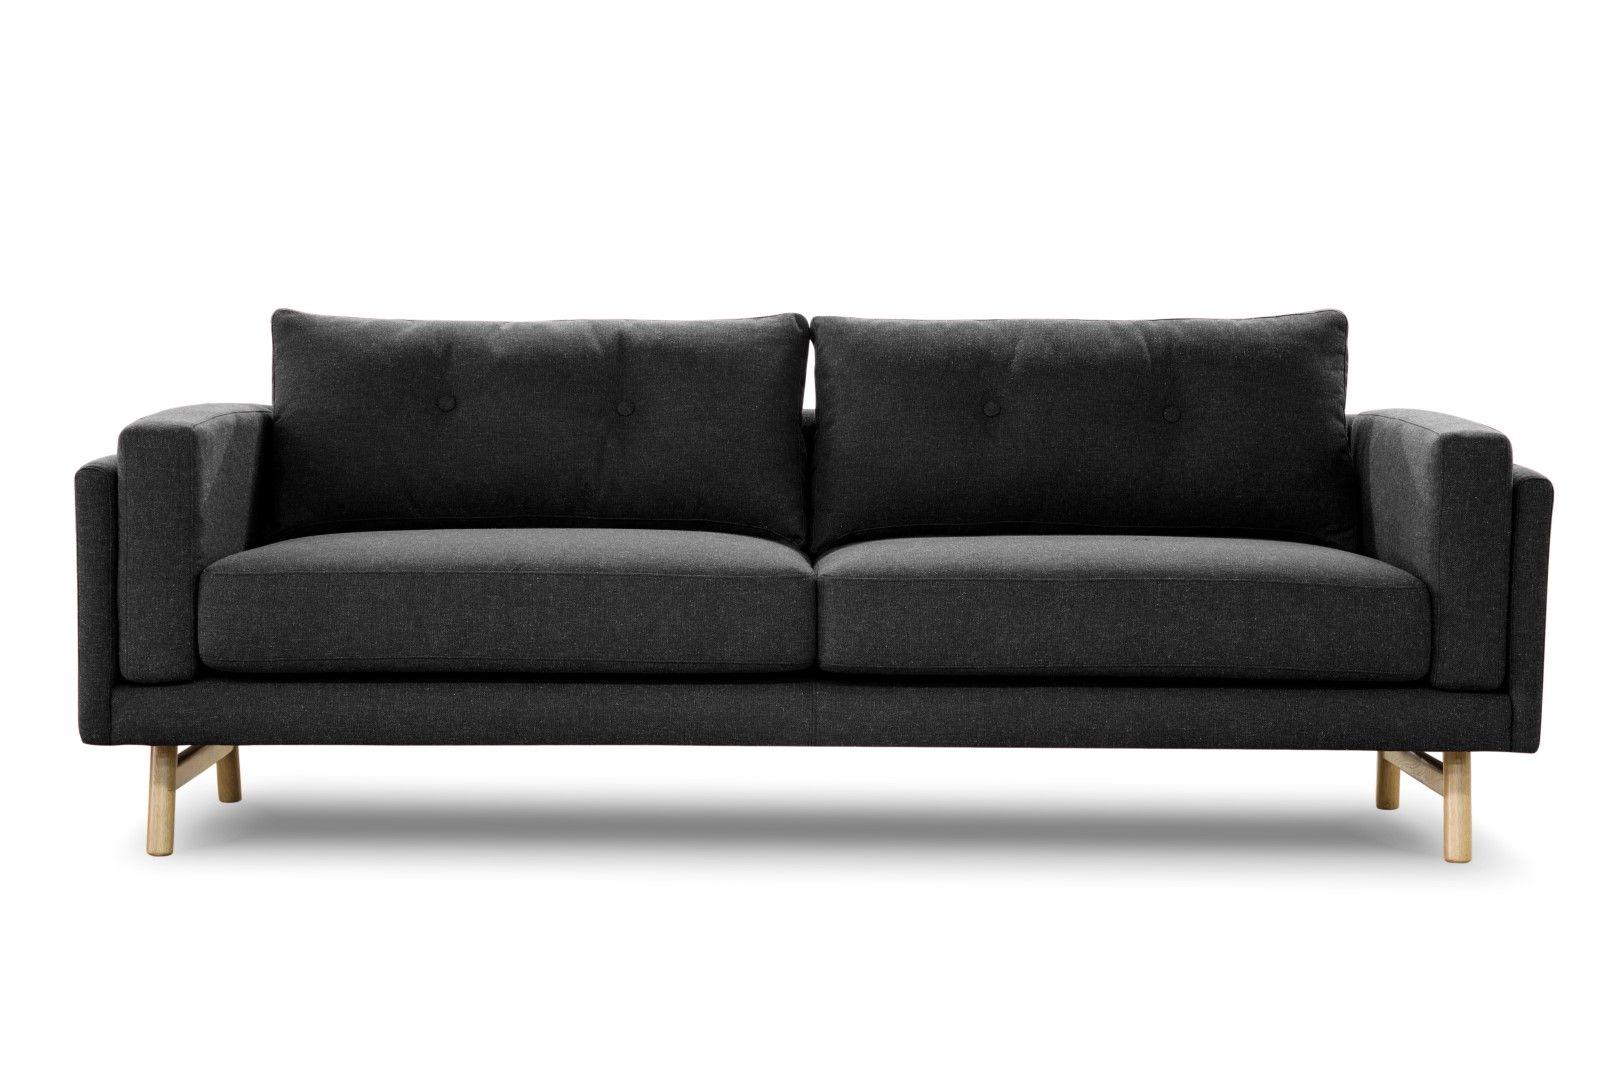 Buy Ladbroke Large 3 Seater Fabric Sofa In Edinburgh Bible Black